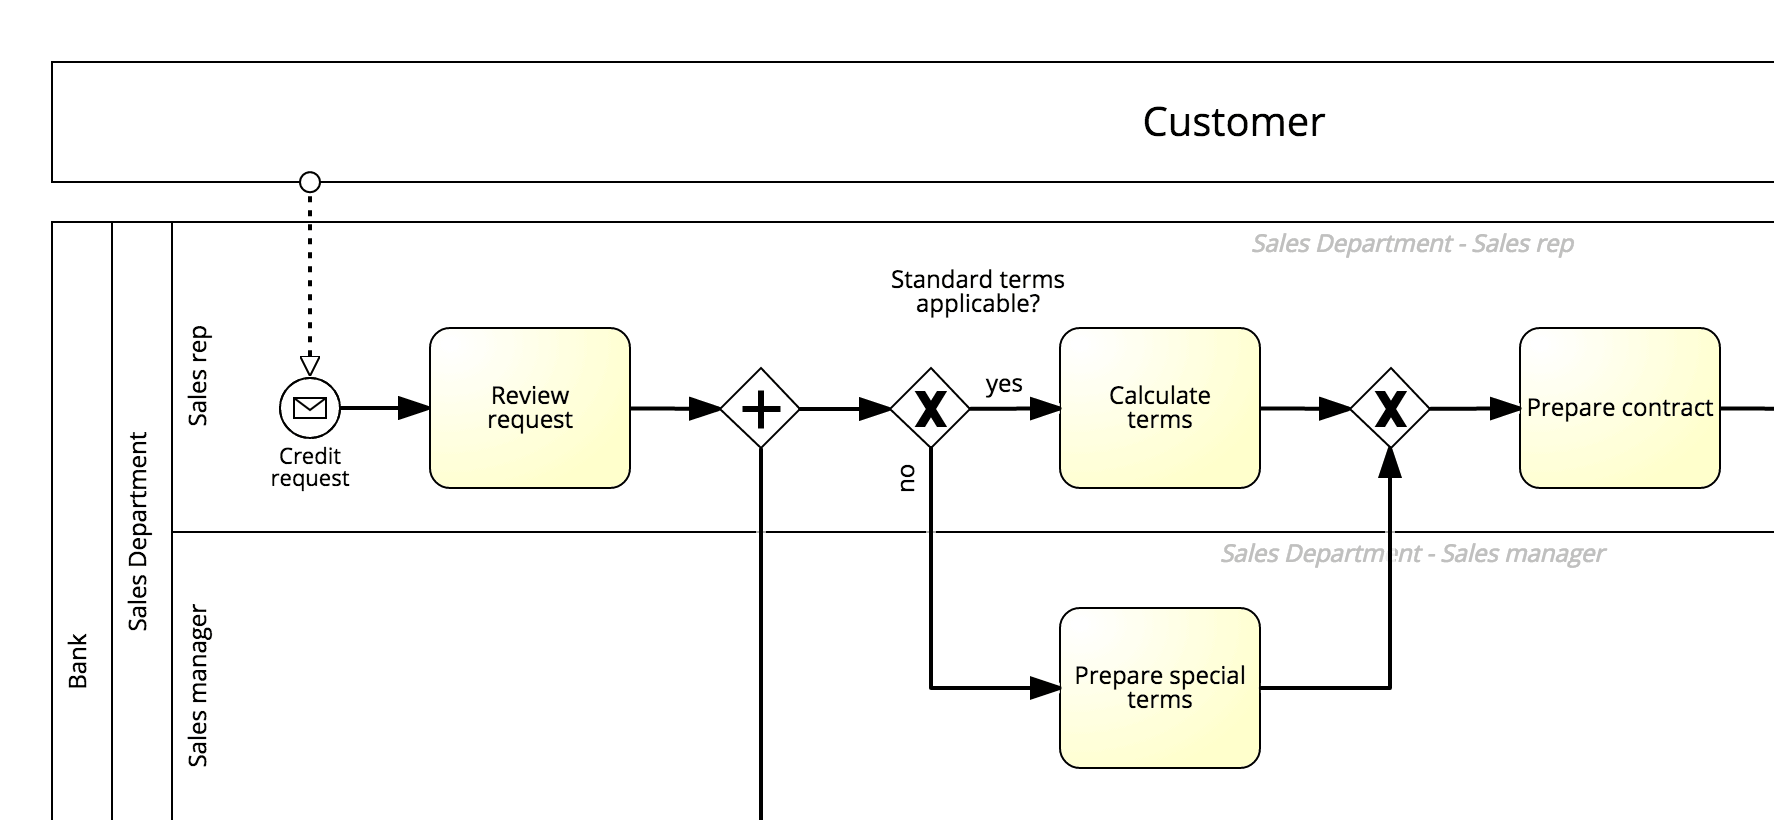 correct - model deviation explicitly